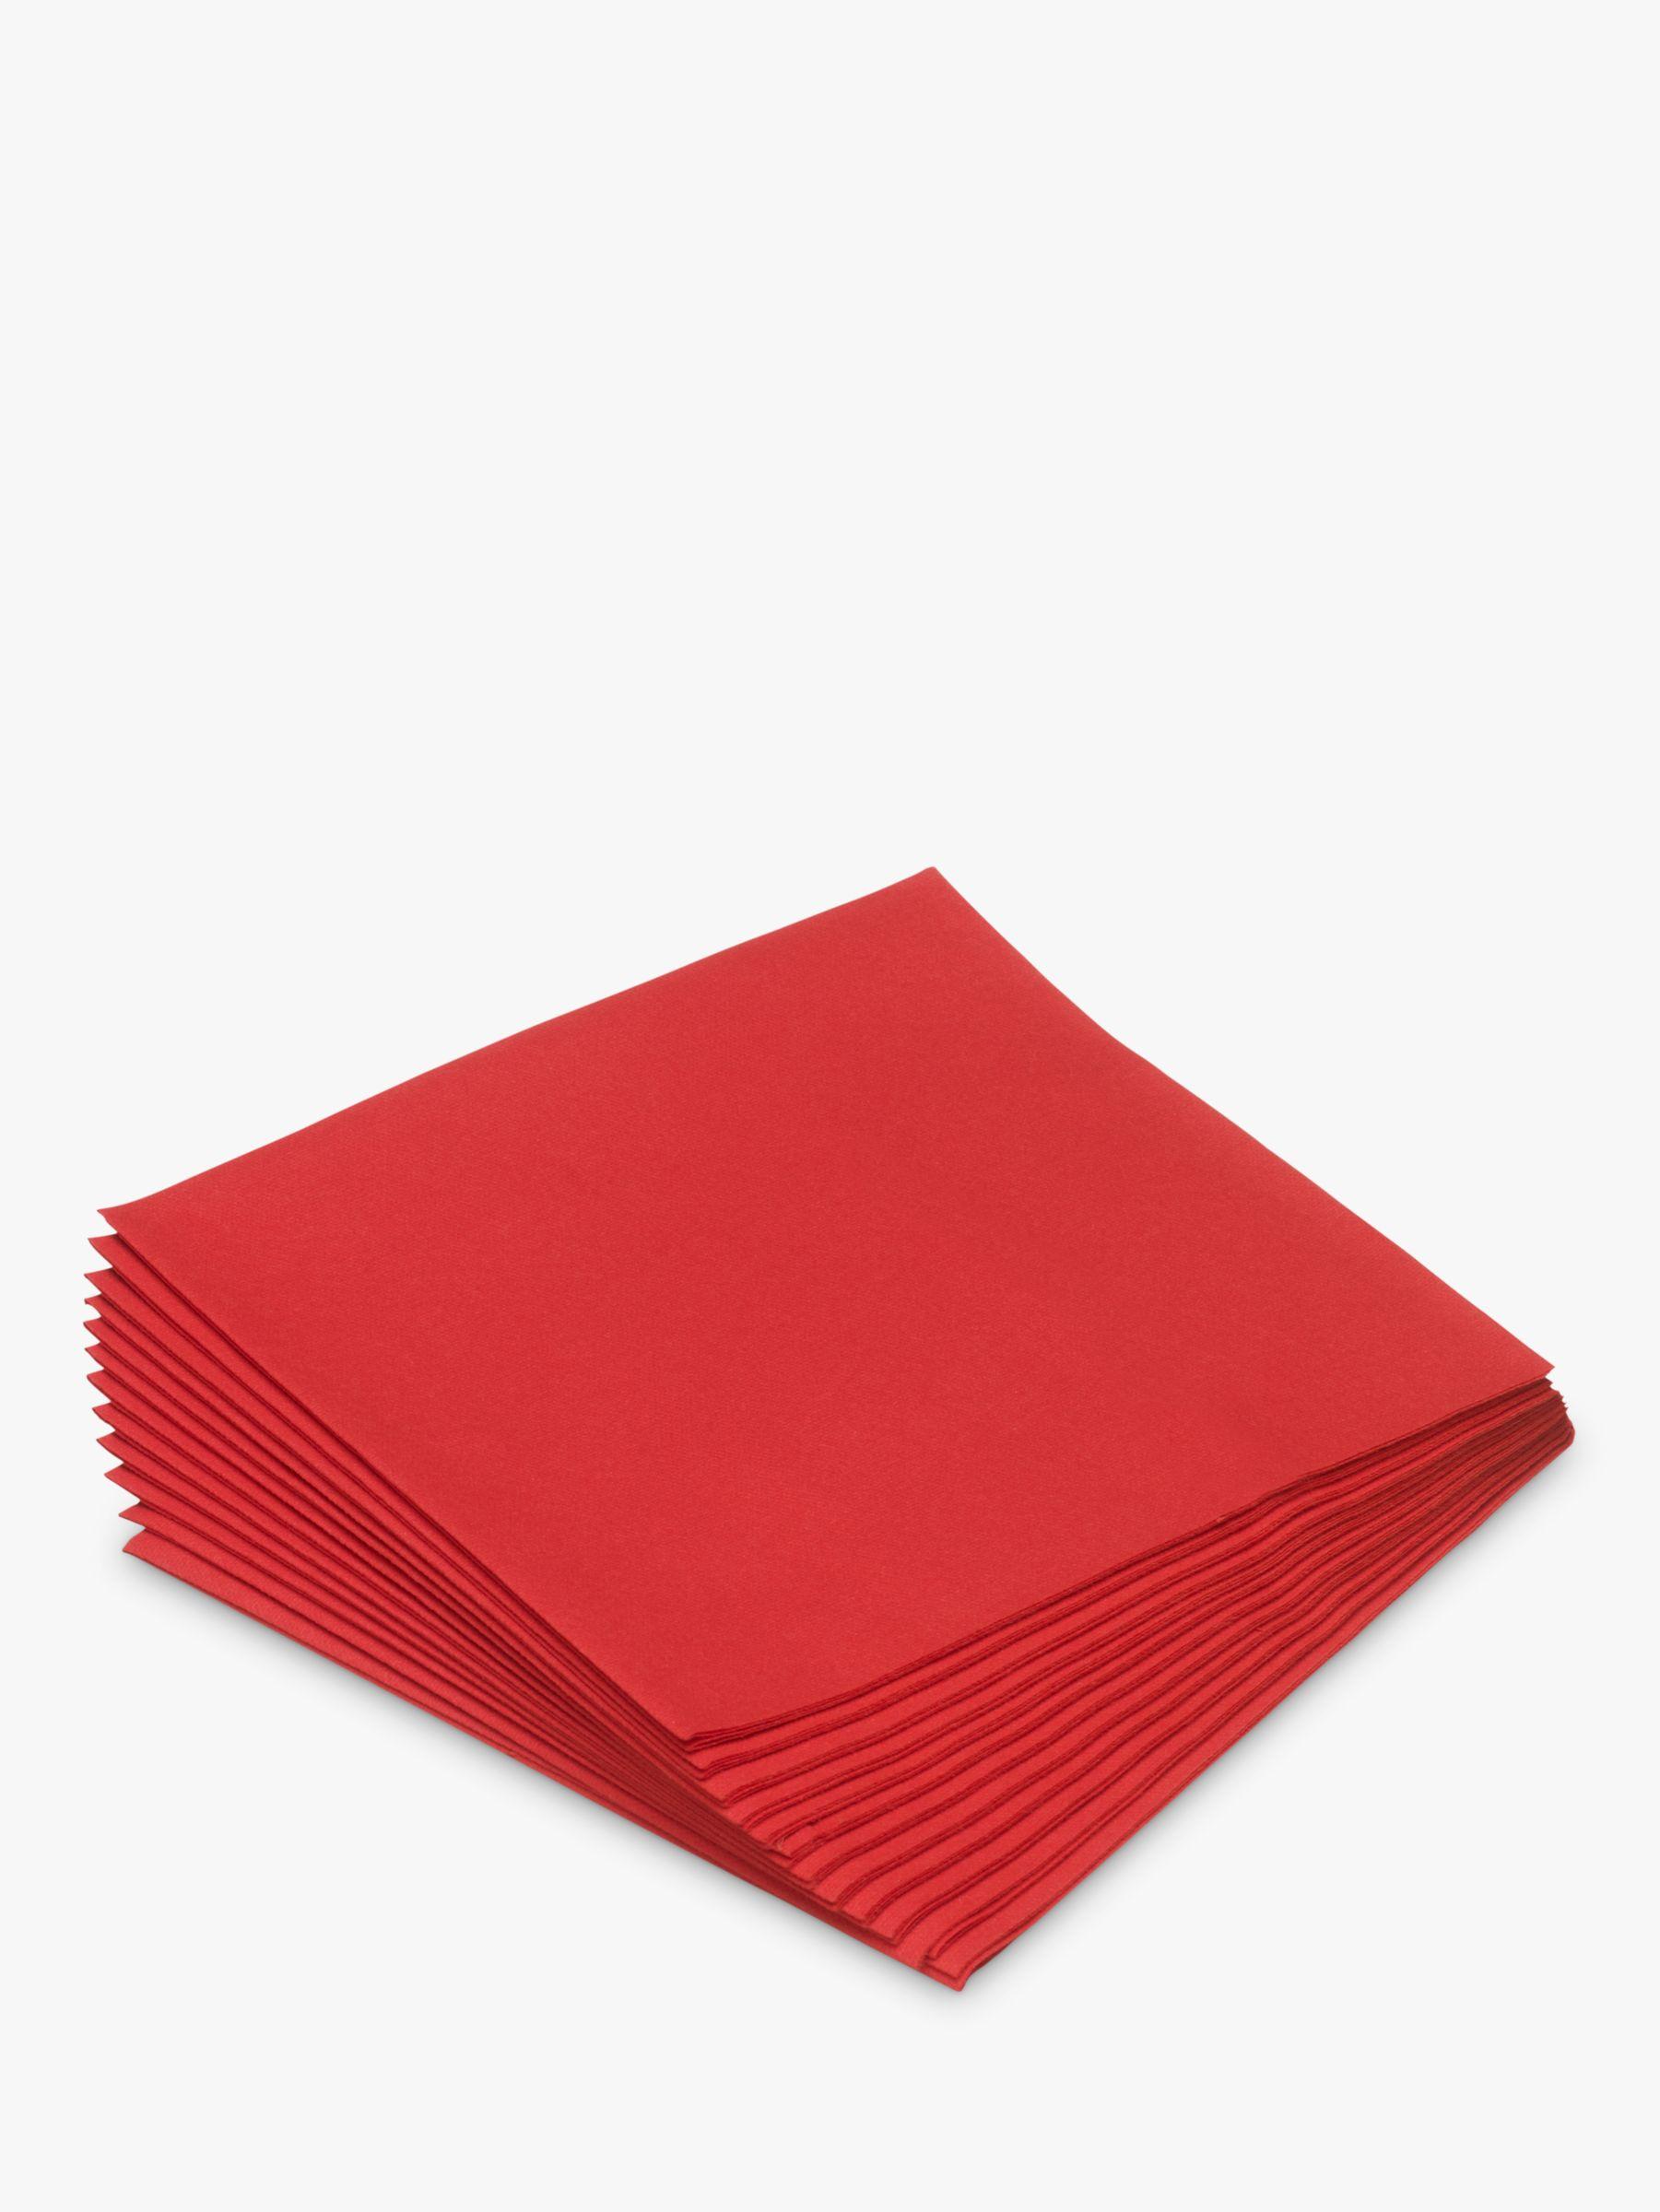 Duni Duni Paper Napkins, Pack of 20, Red